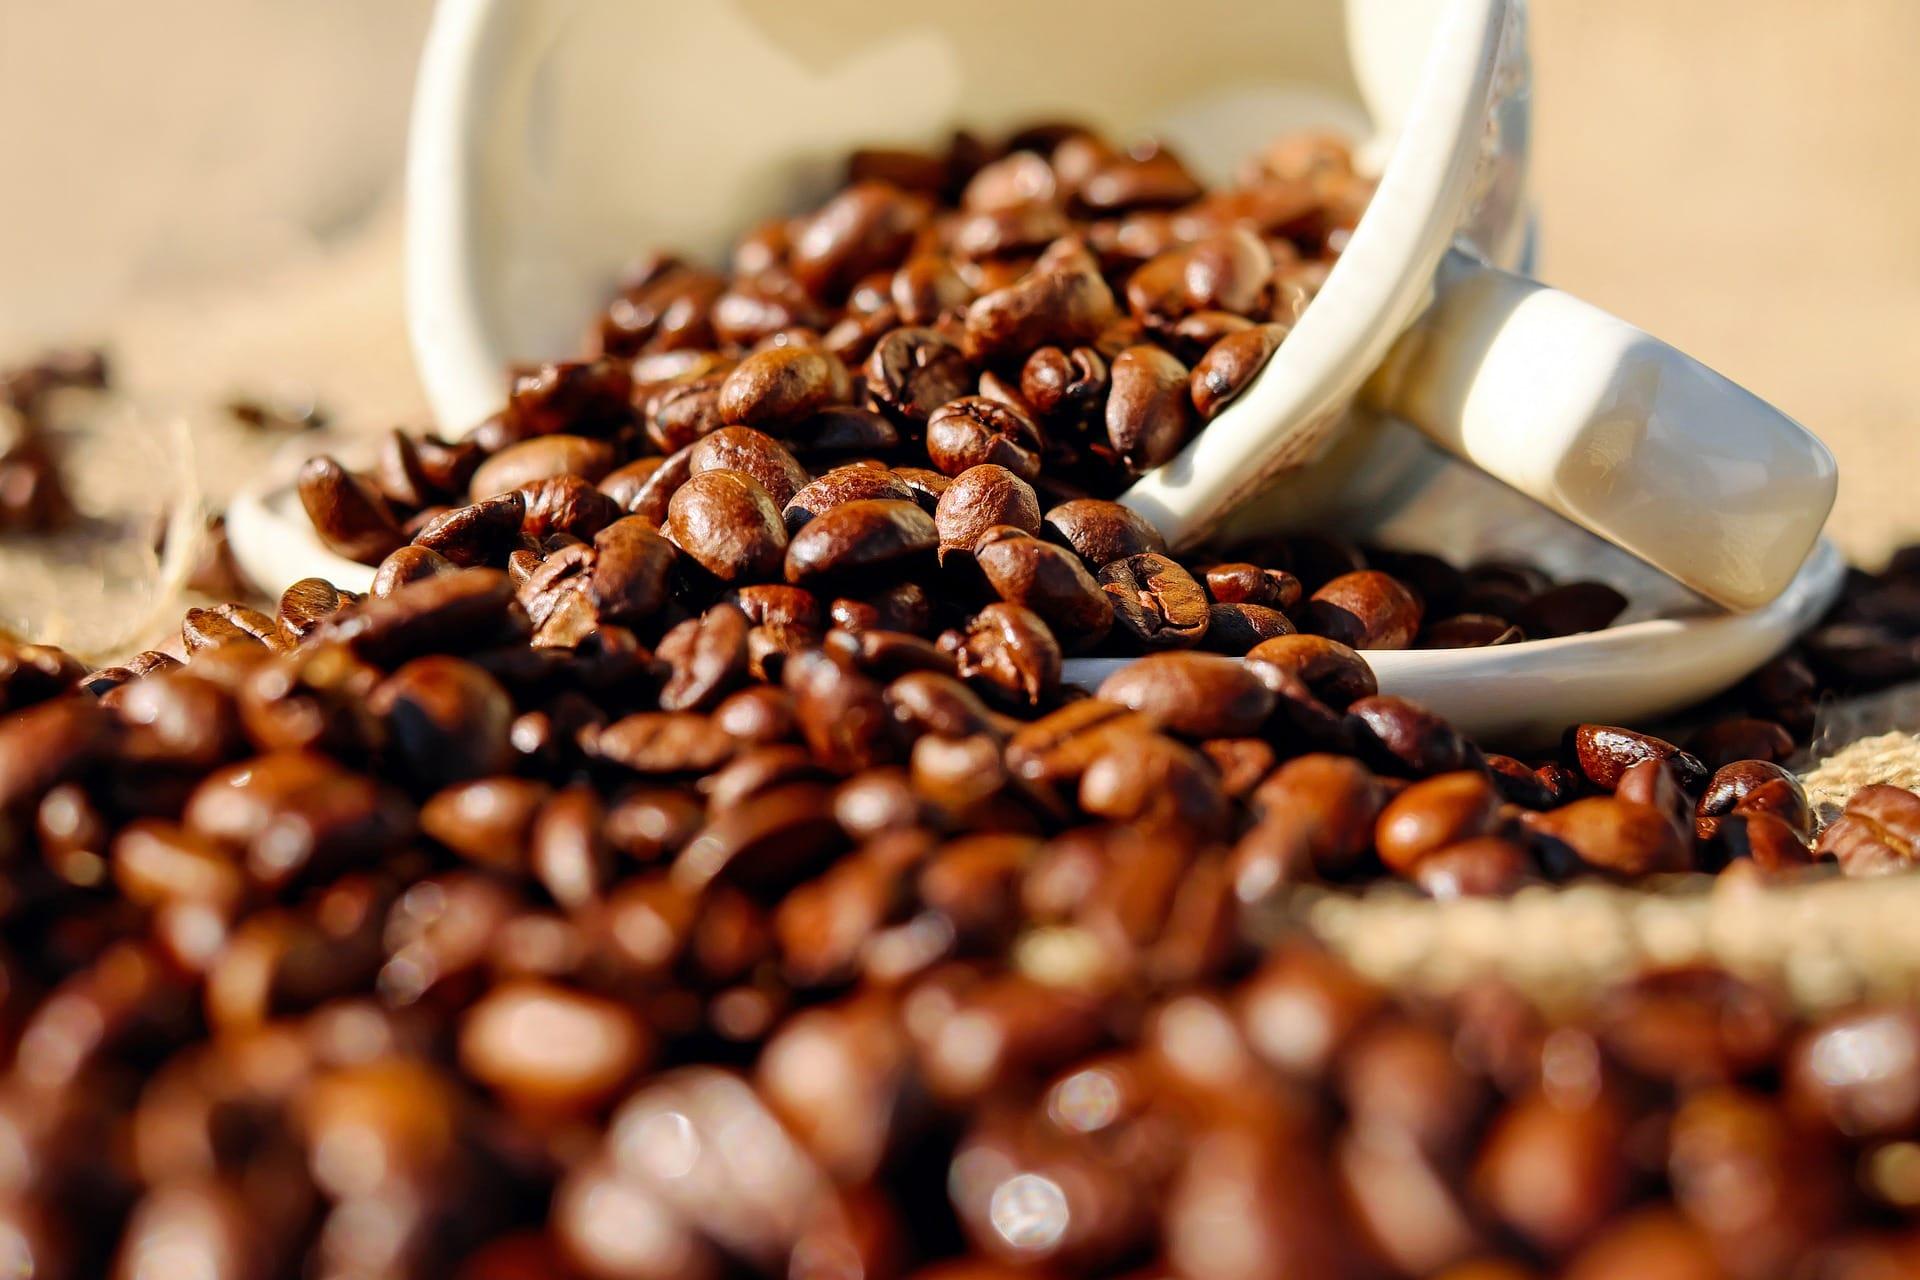 kaffe-kaffekopp-kaffebönor-bönor